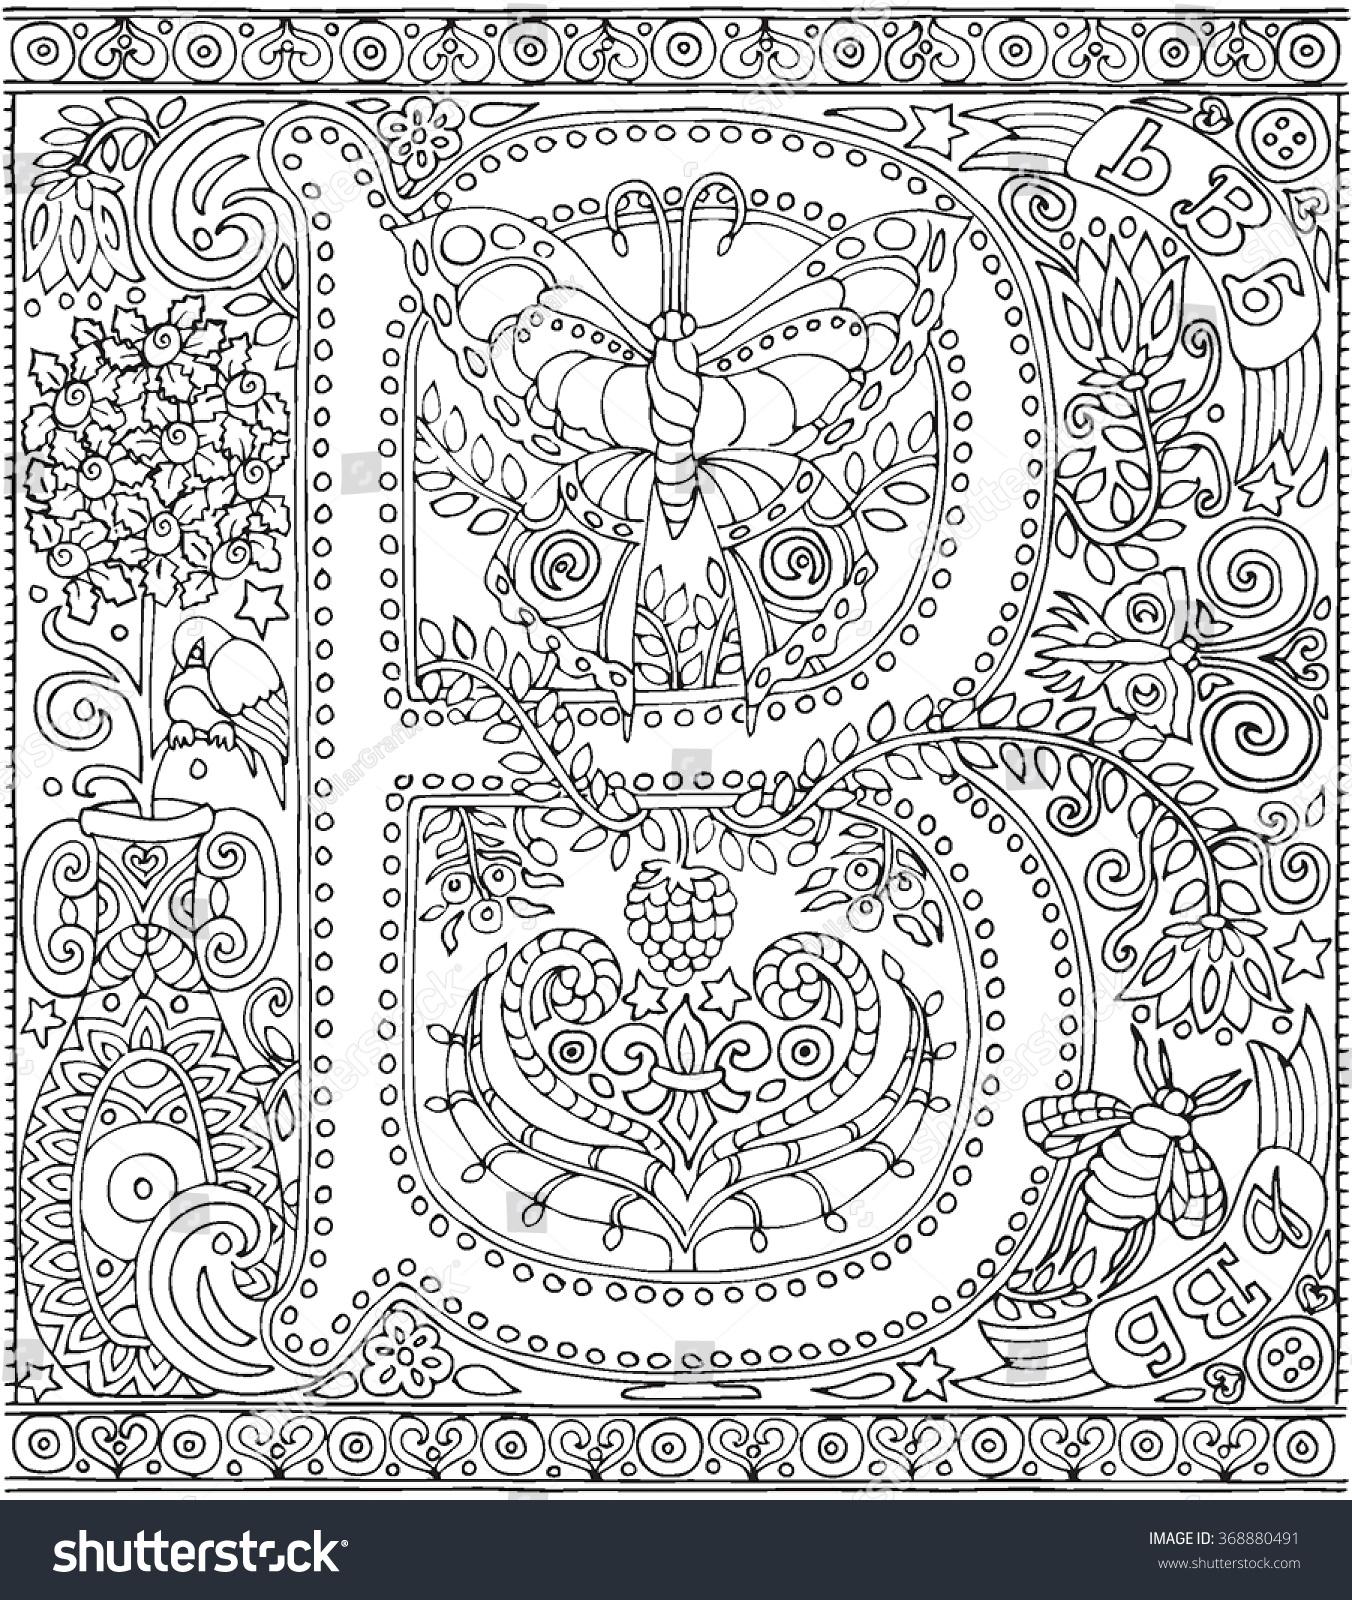 Zen colouring in book - Adult Coloring Book Art Alphabet Letter B Zen Relaxation